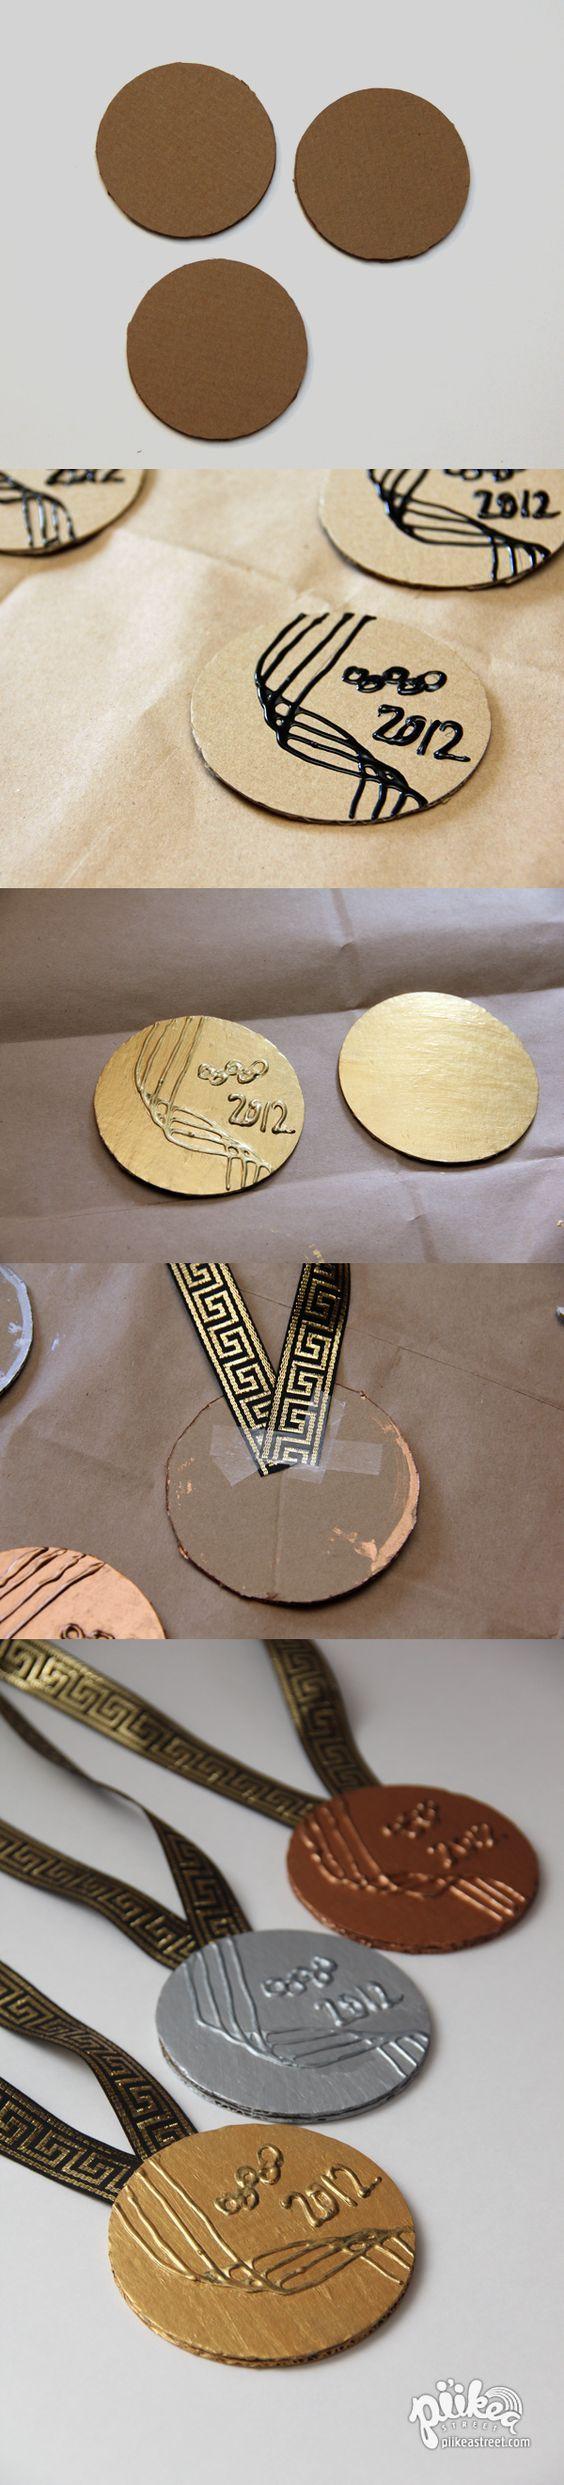 Turn cardboard into Olympic Medals. An Original #kids #craft by www.piikeastreet.com #piikeastreet